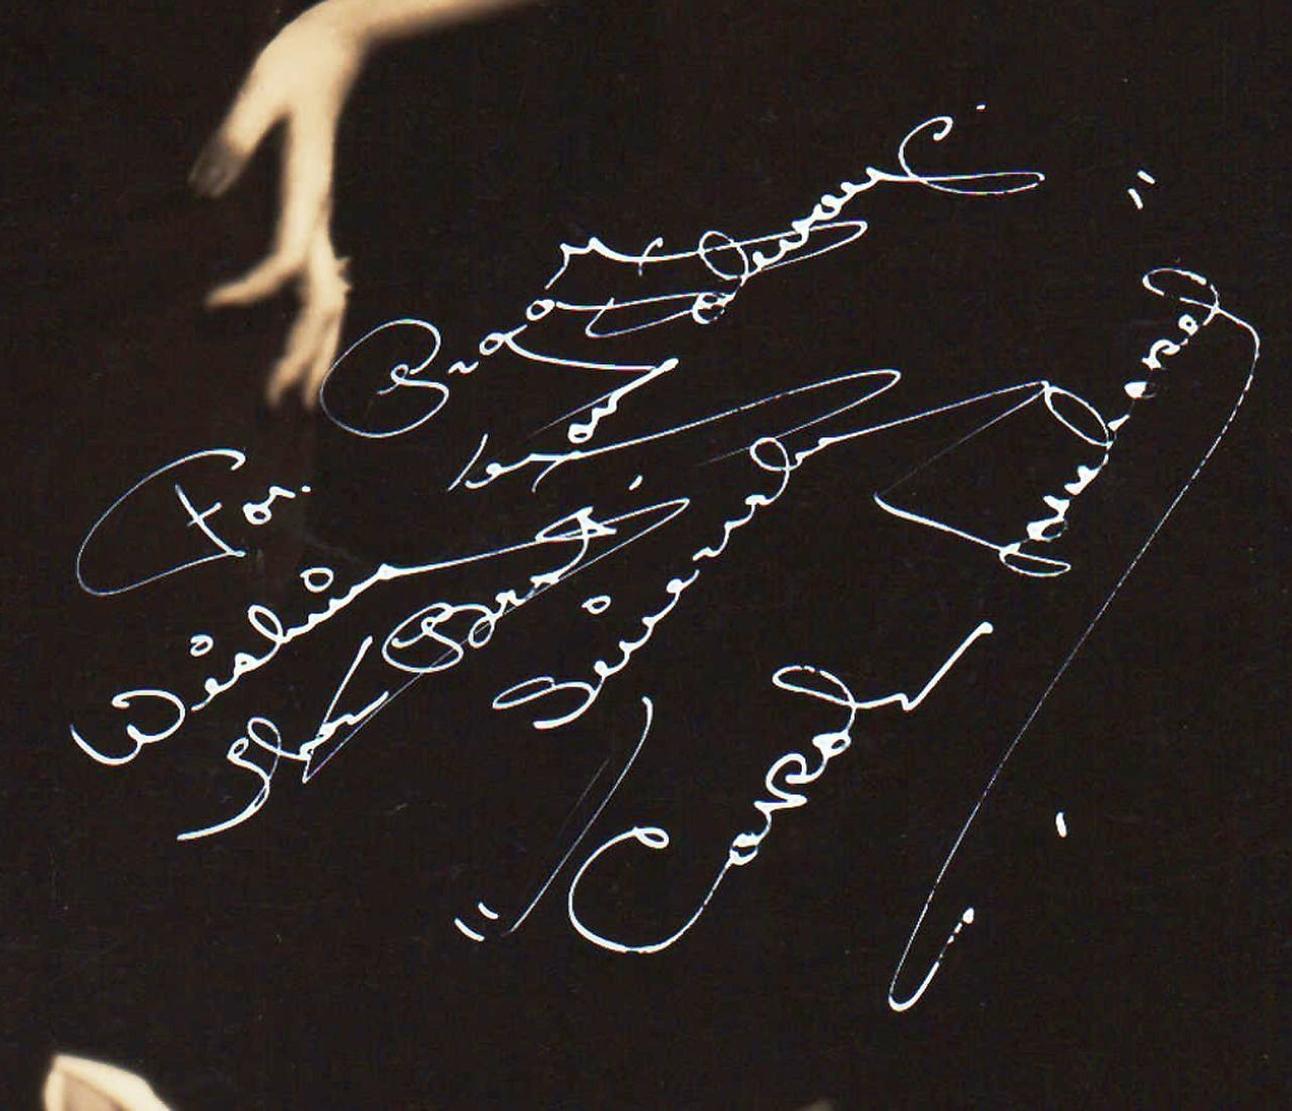 carole lombard autograph 81a inset